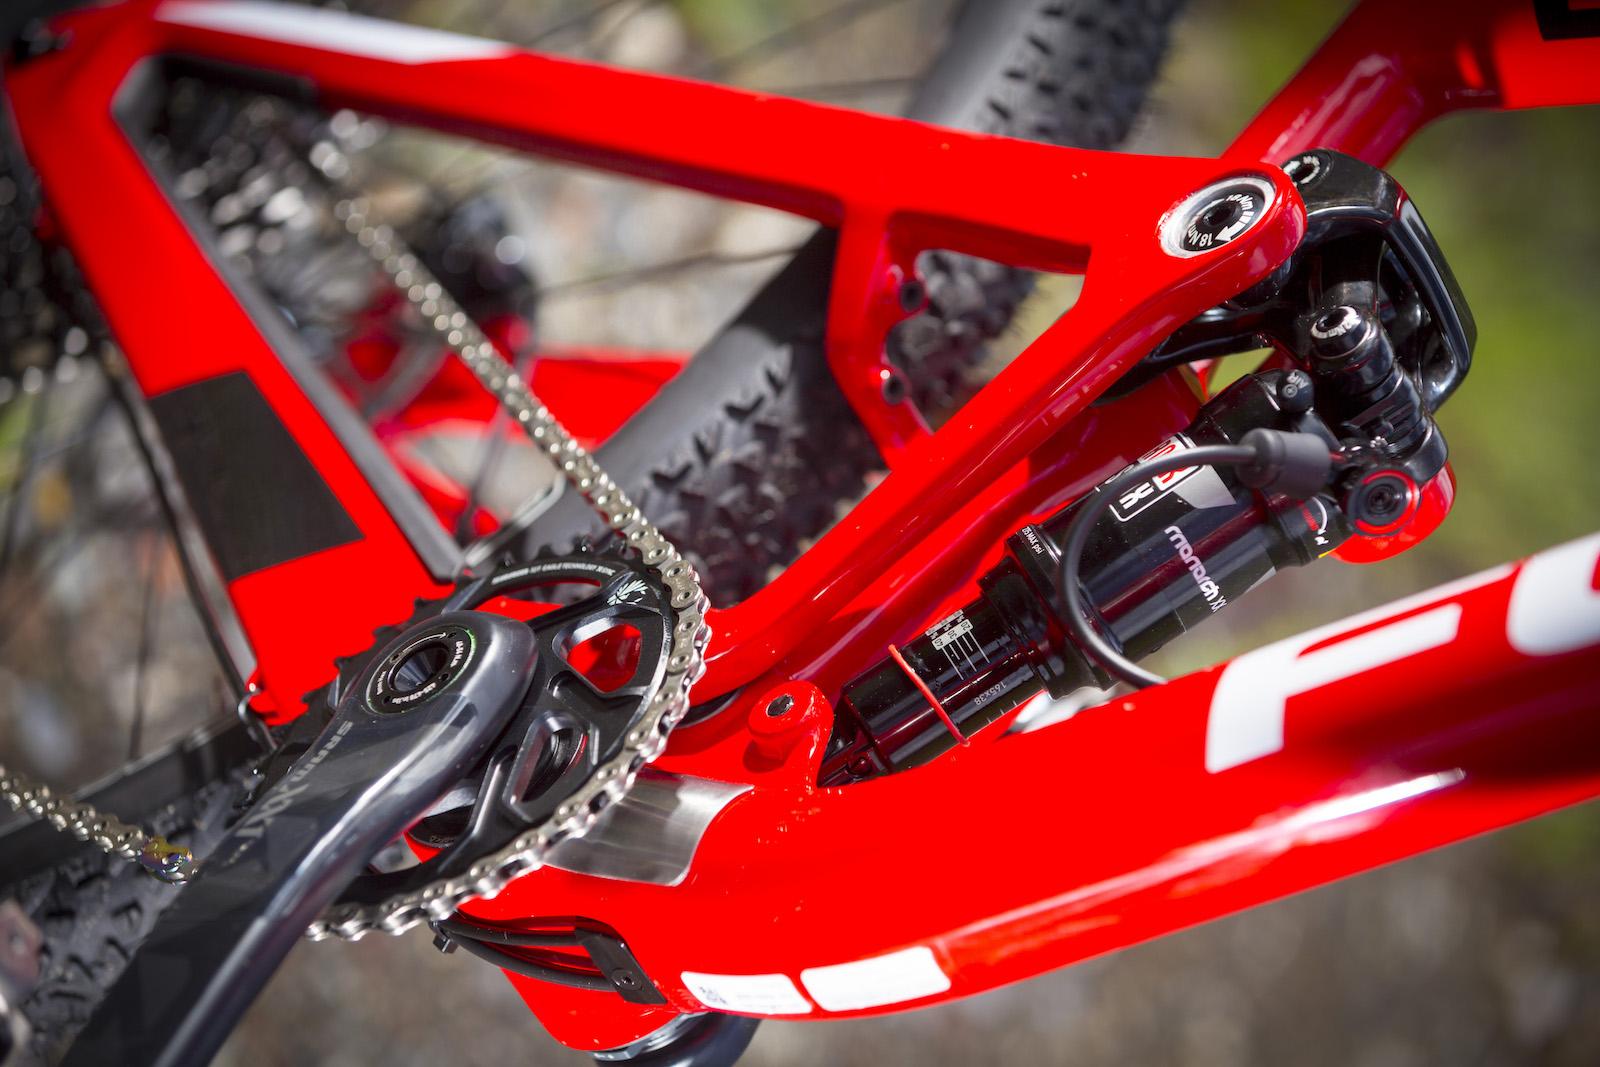 GD255846_Focus Morzine 2016 Bikes_One